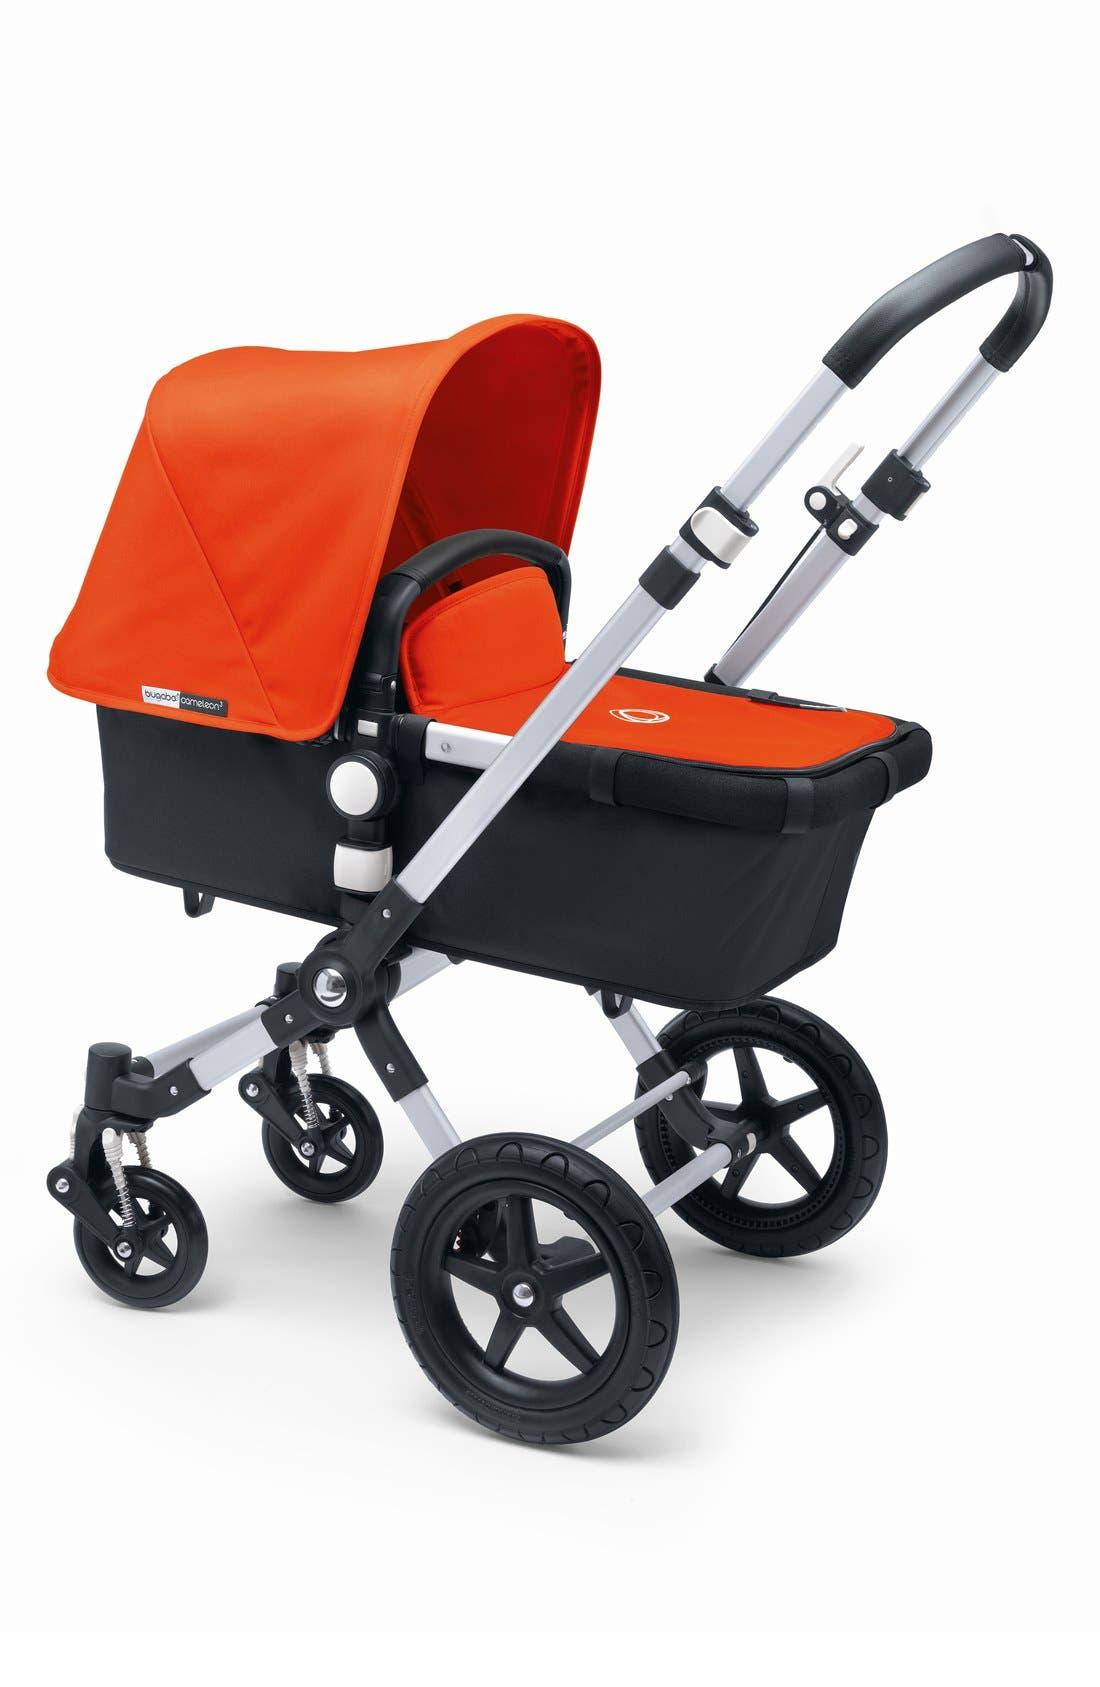 Alternate Image 1 Selected - Bugaboo Cameleon³ Stroller